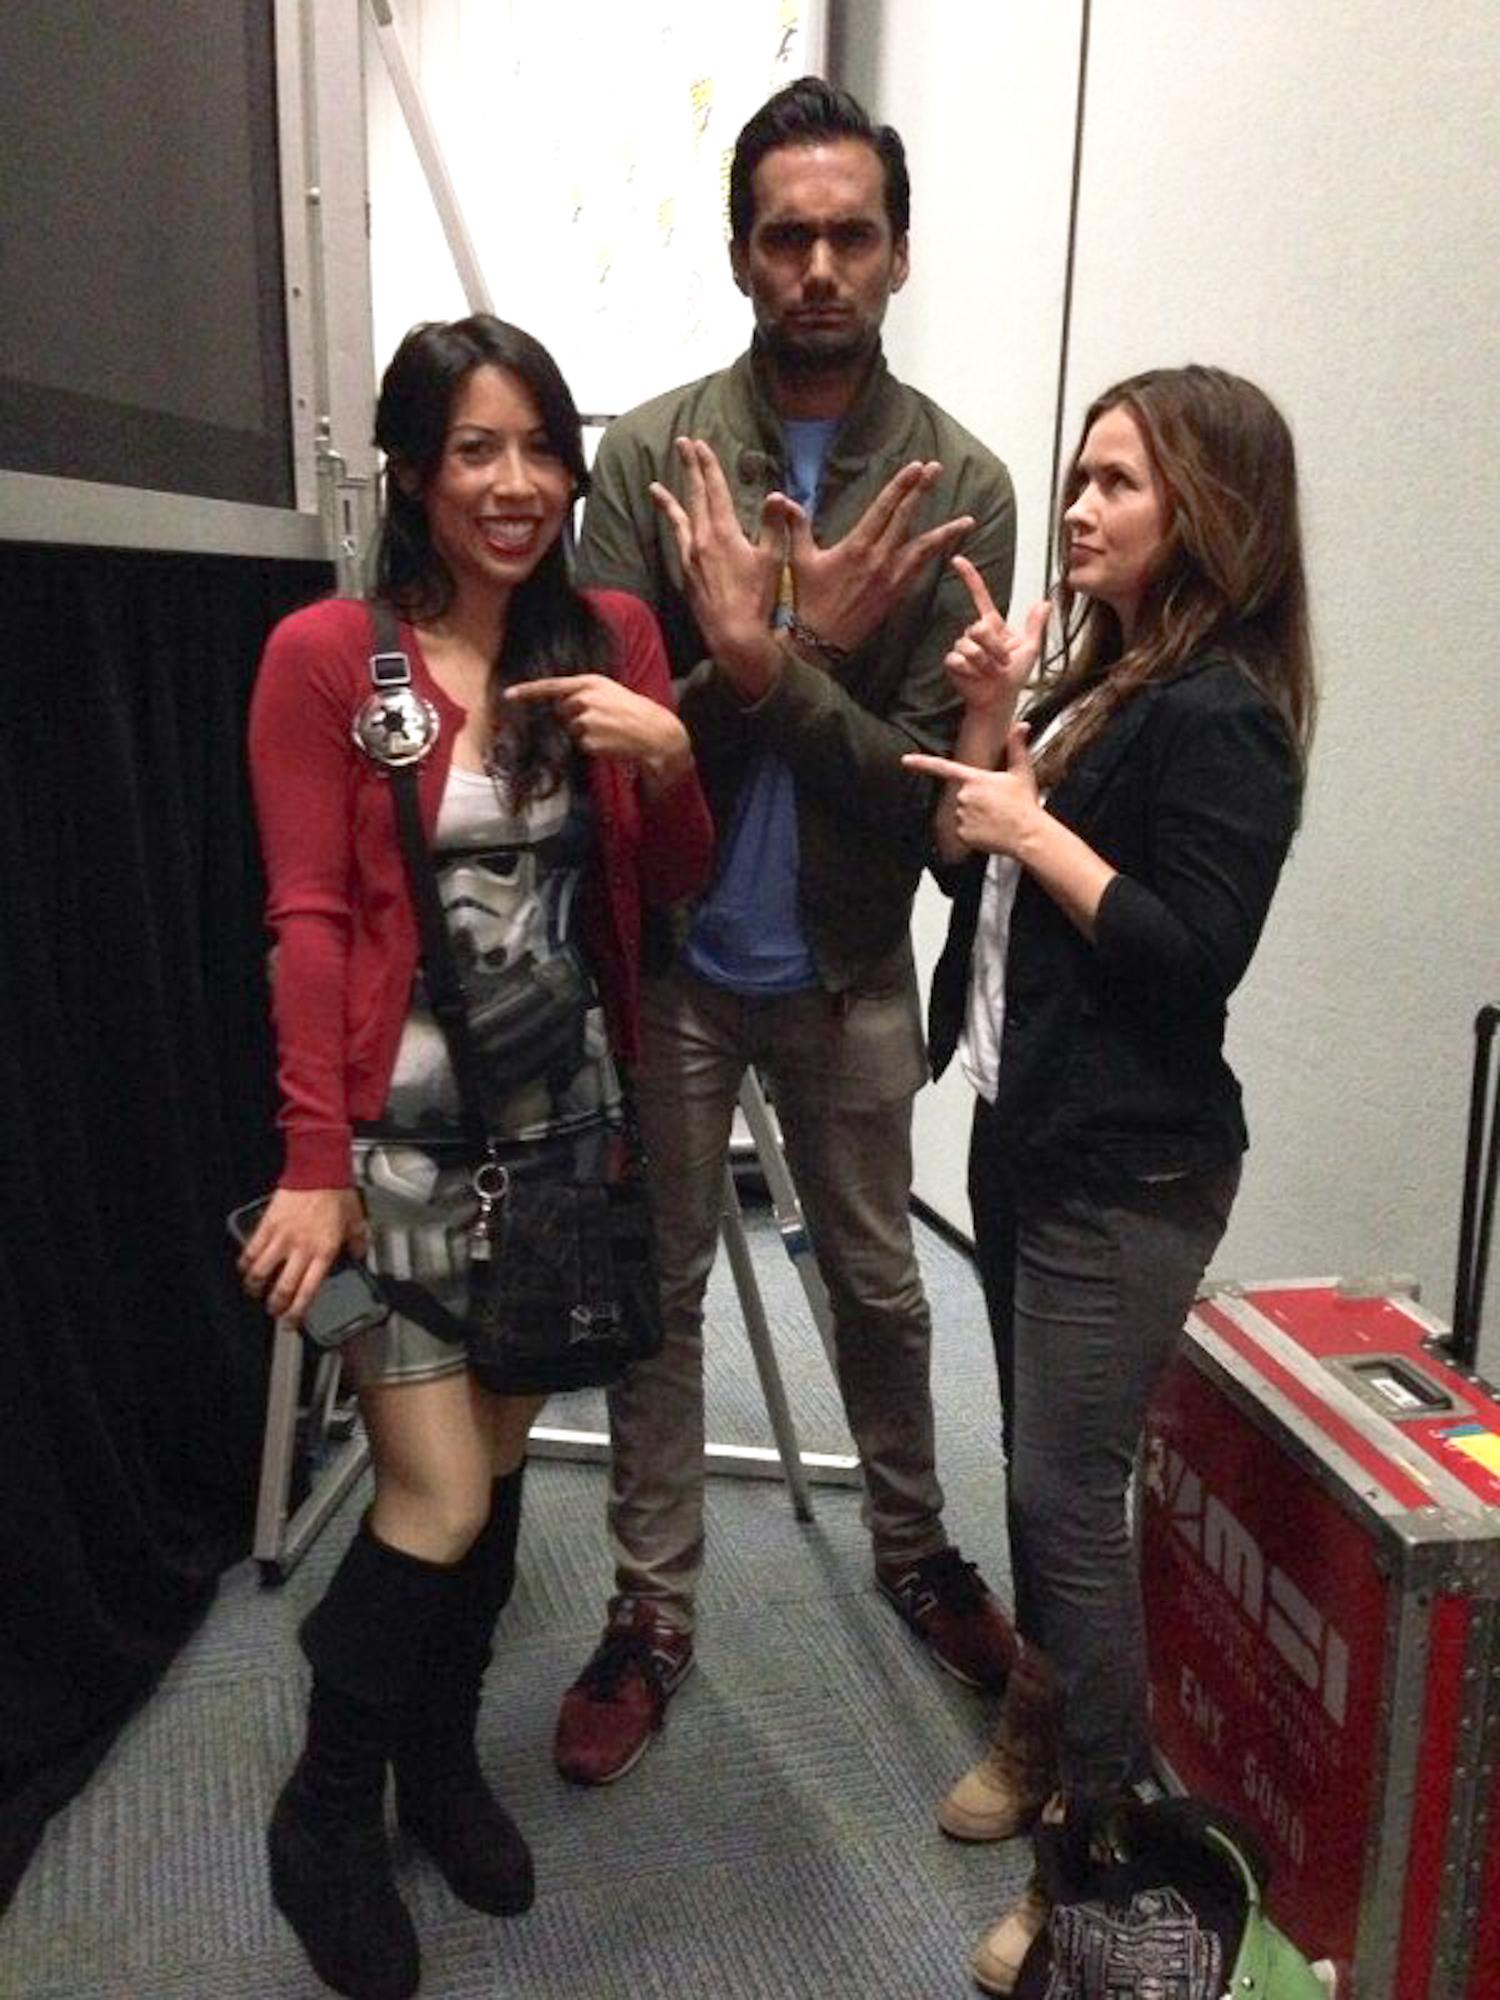 Andrea Letamendi, Ali Mattu, and Catherine Taber prep for the Psychology of Star Trek VS. Star Wars WonderCon panel. Photo by Consetta Parker